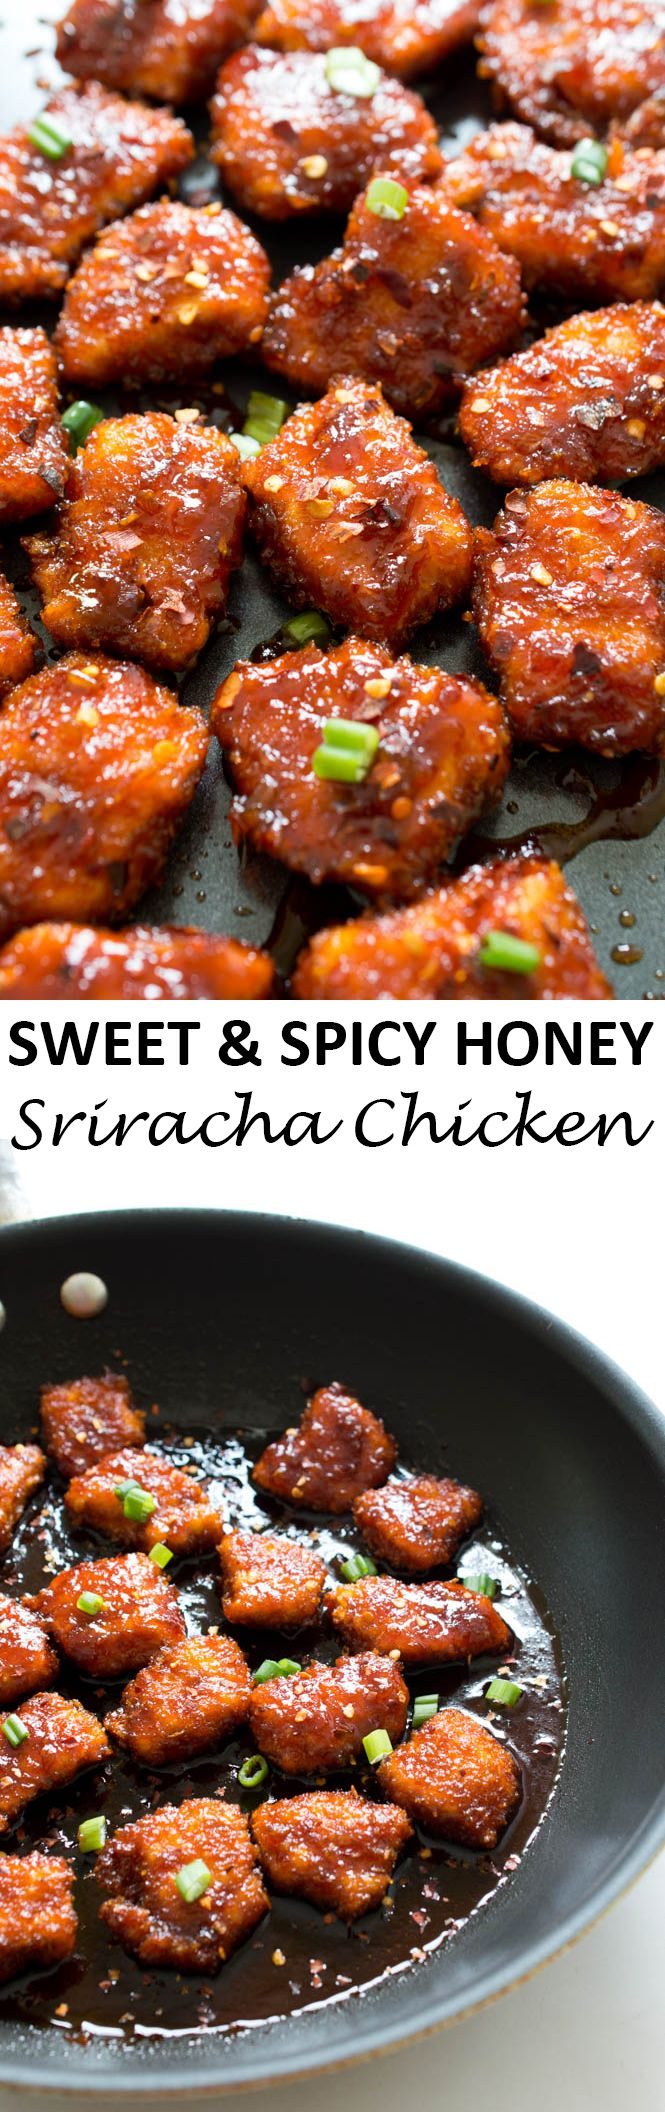 how to make honey chicken batter